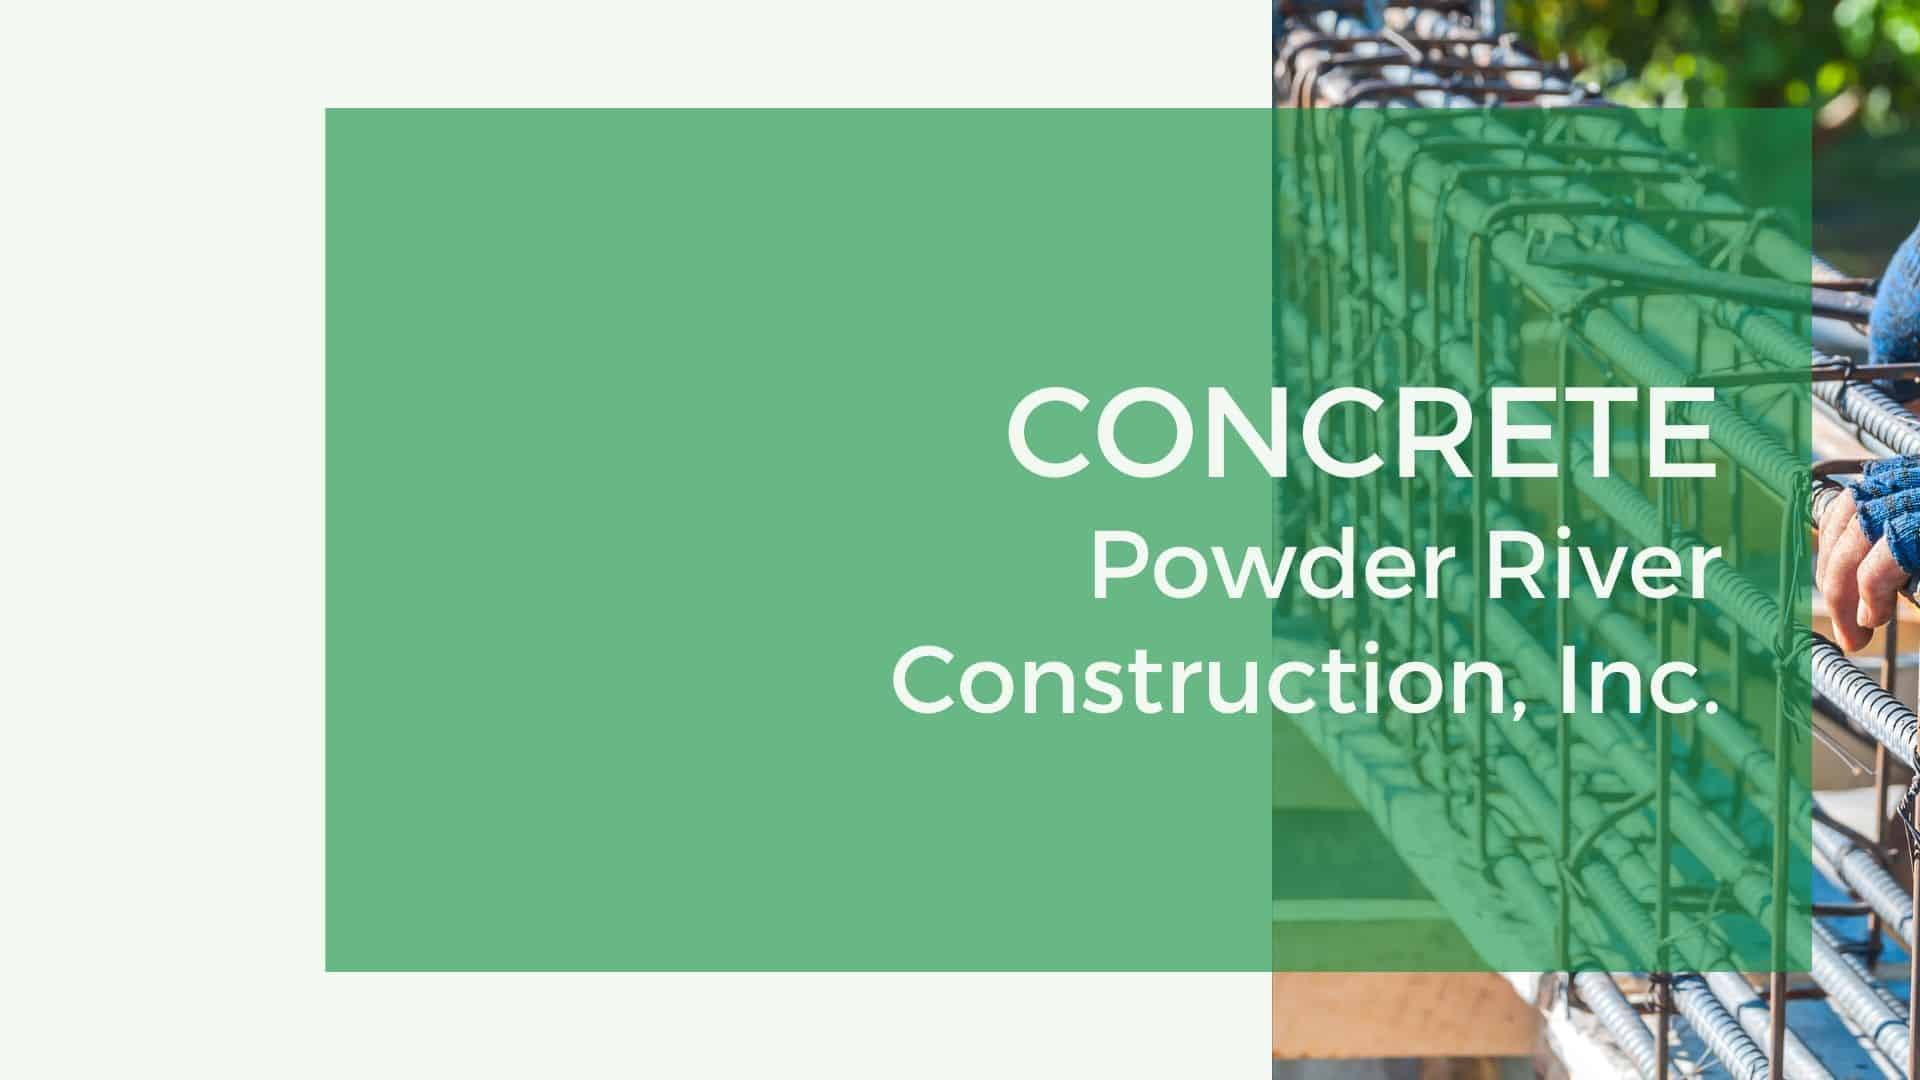 concrete services featured image